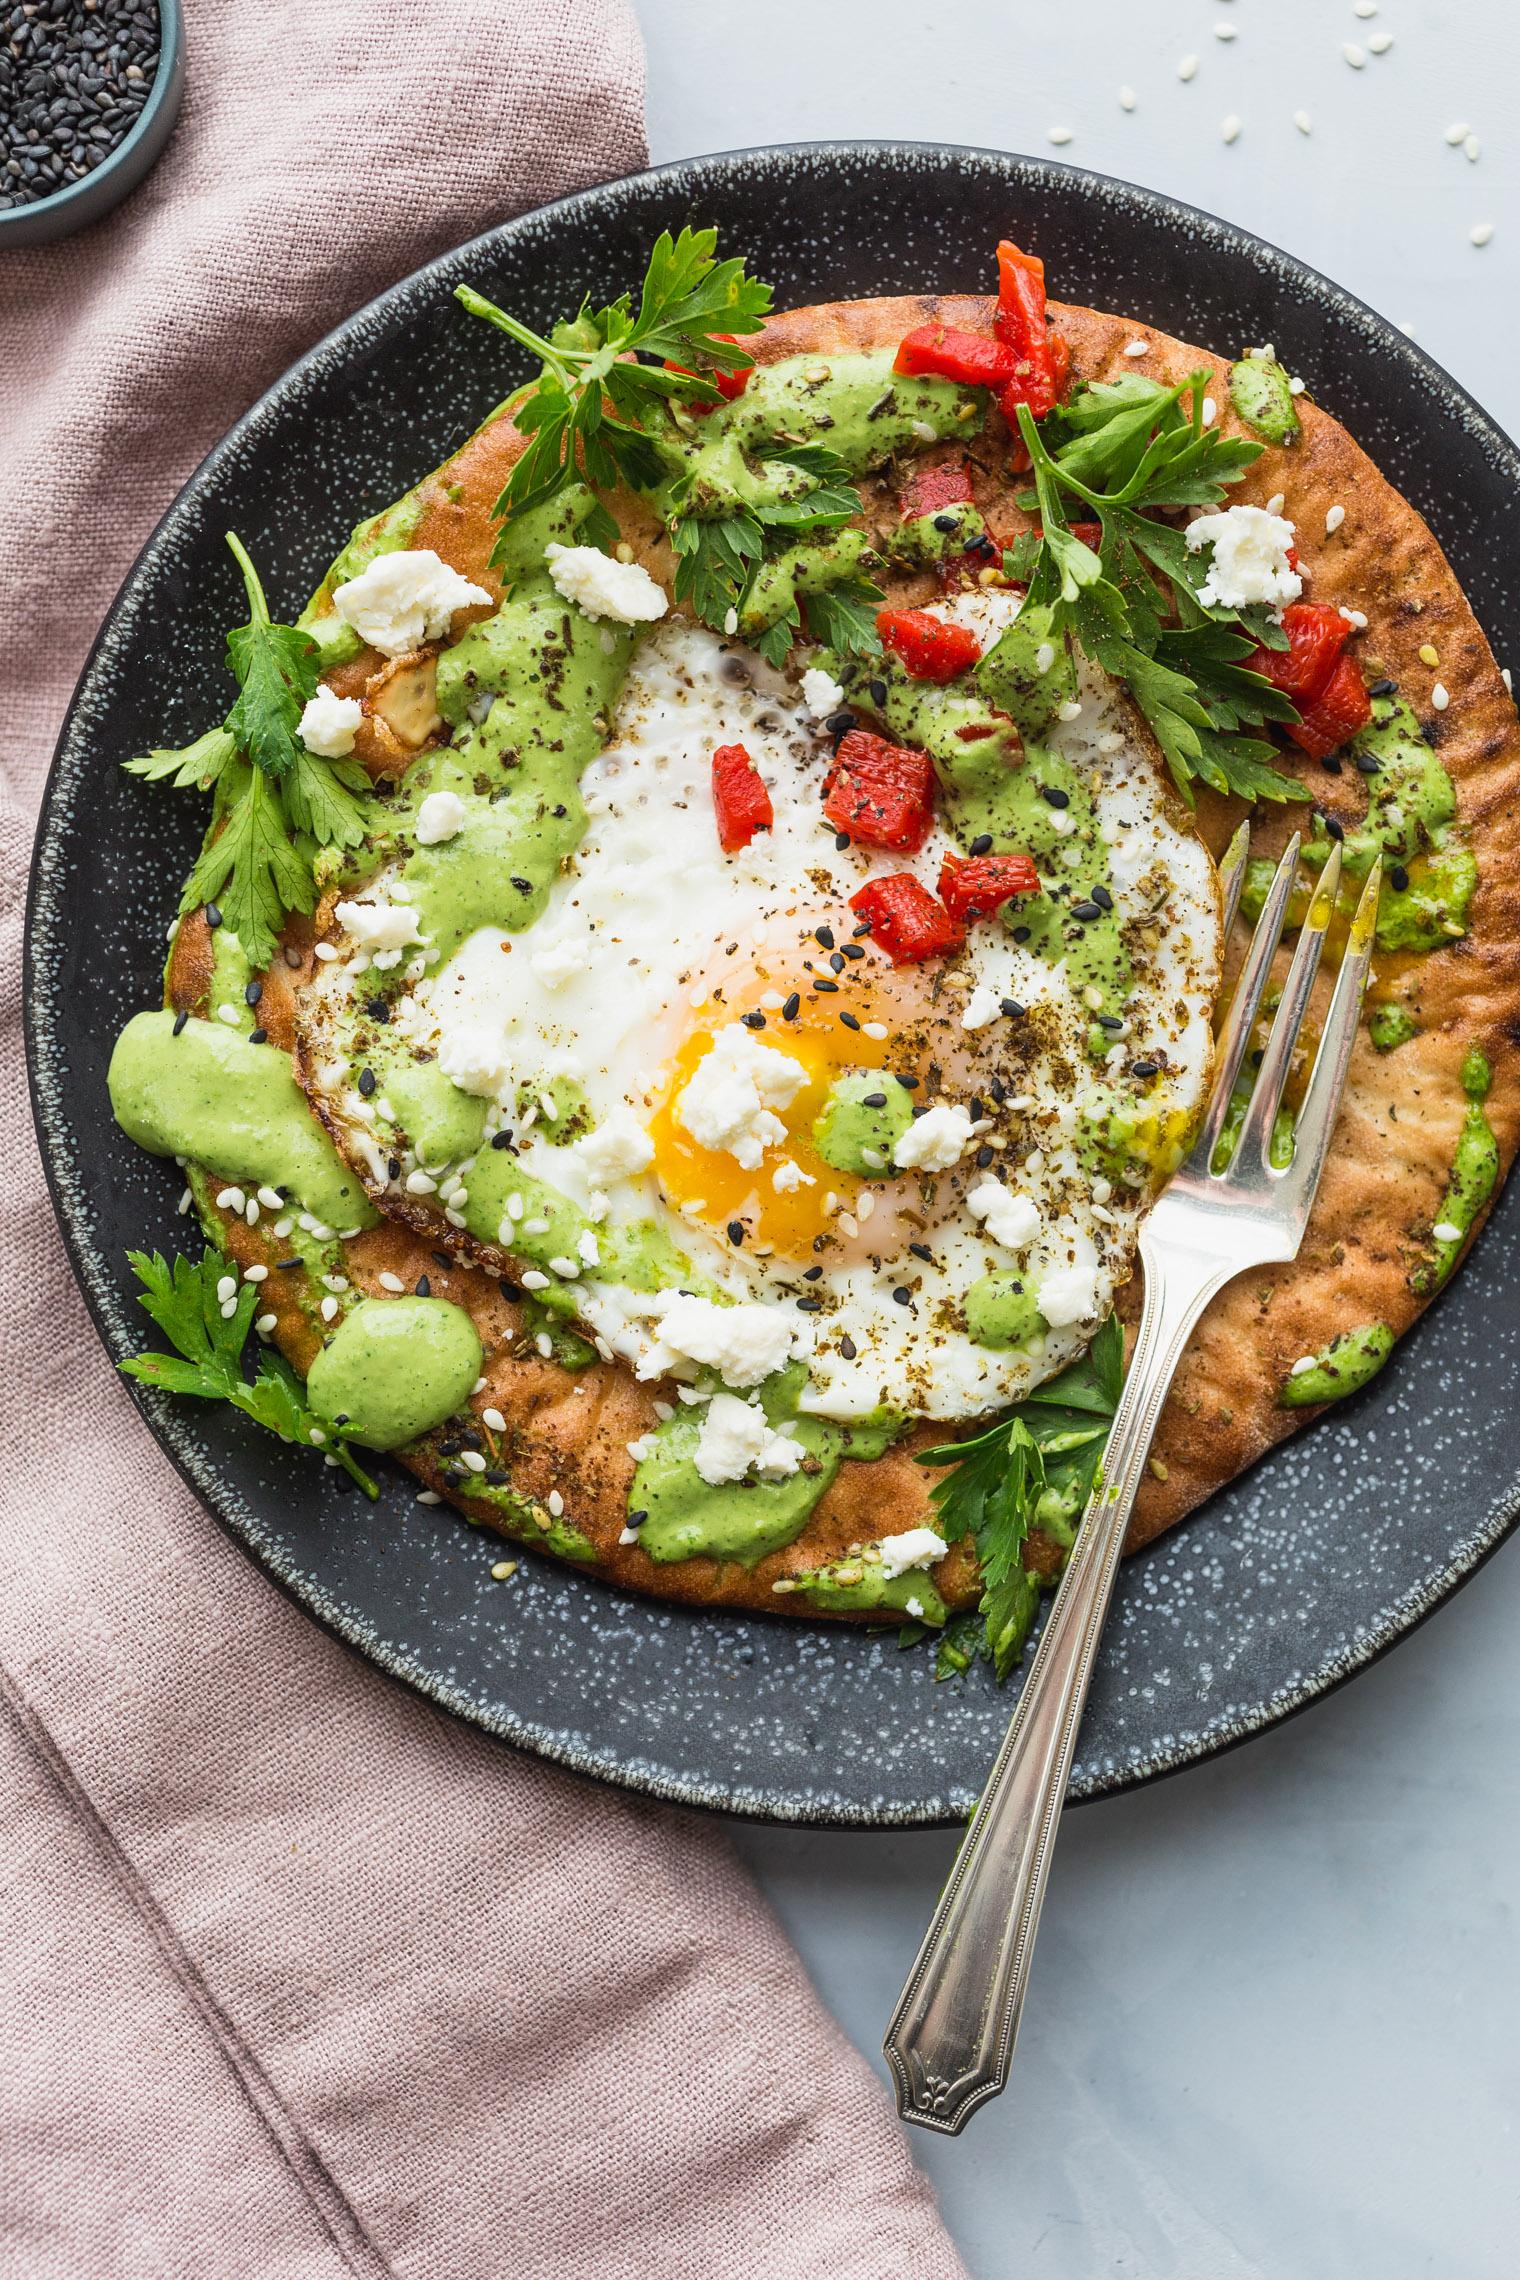 Fried Eggs with Green Tahini and Pita